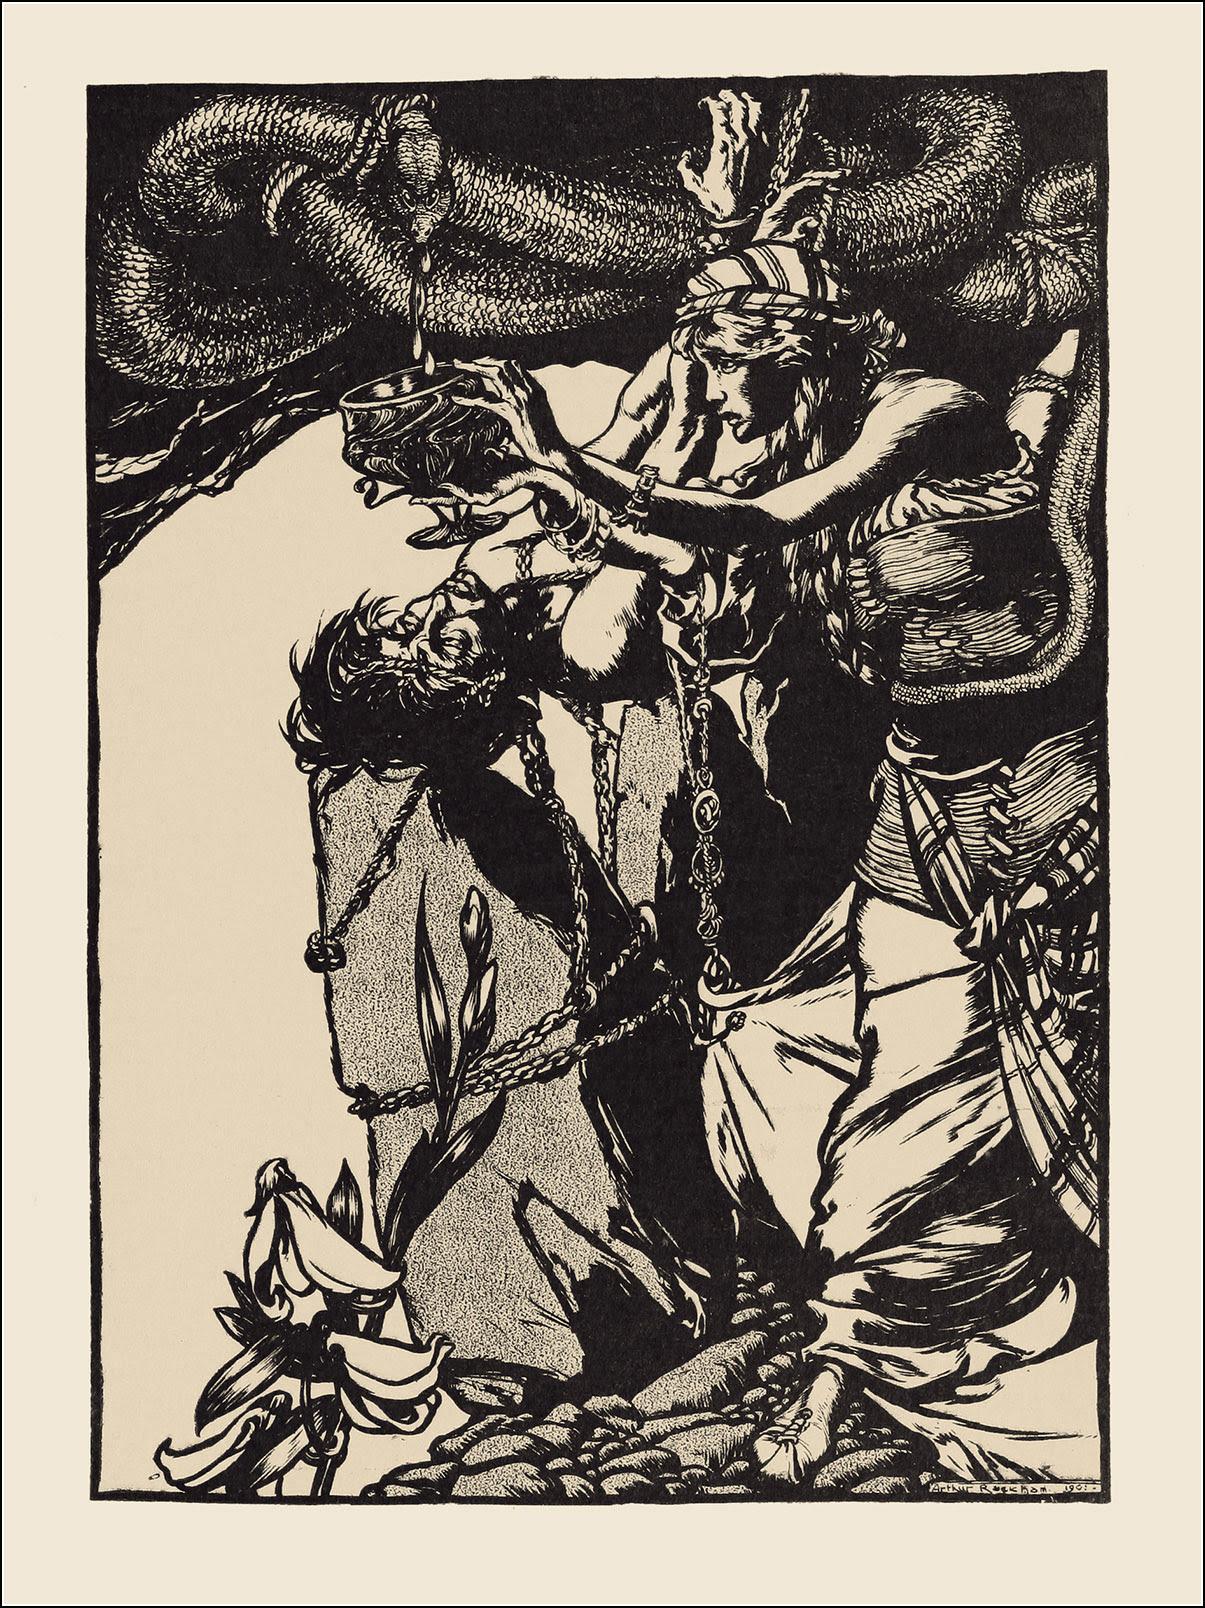 Arthur Rackham, The land of enchantment